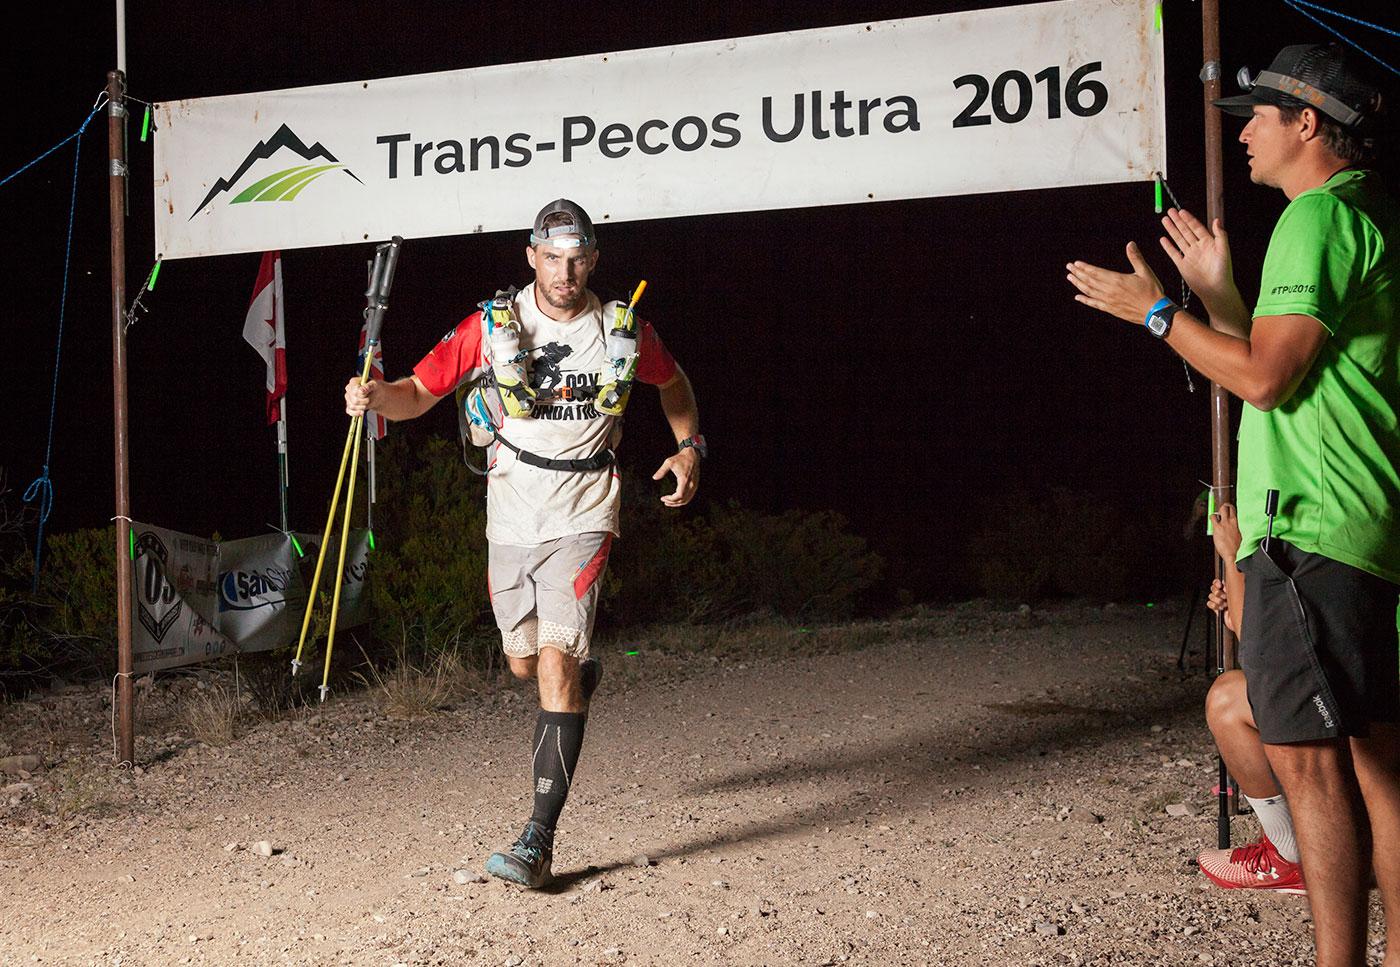 Trans-Pecos-Ultra-ABP-Thomas-finish.jpg